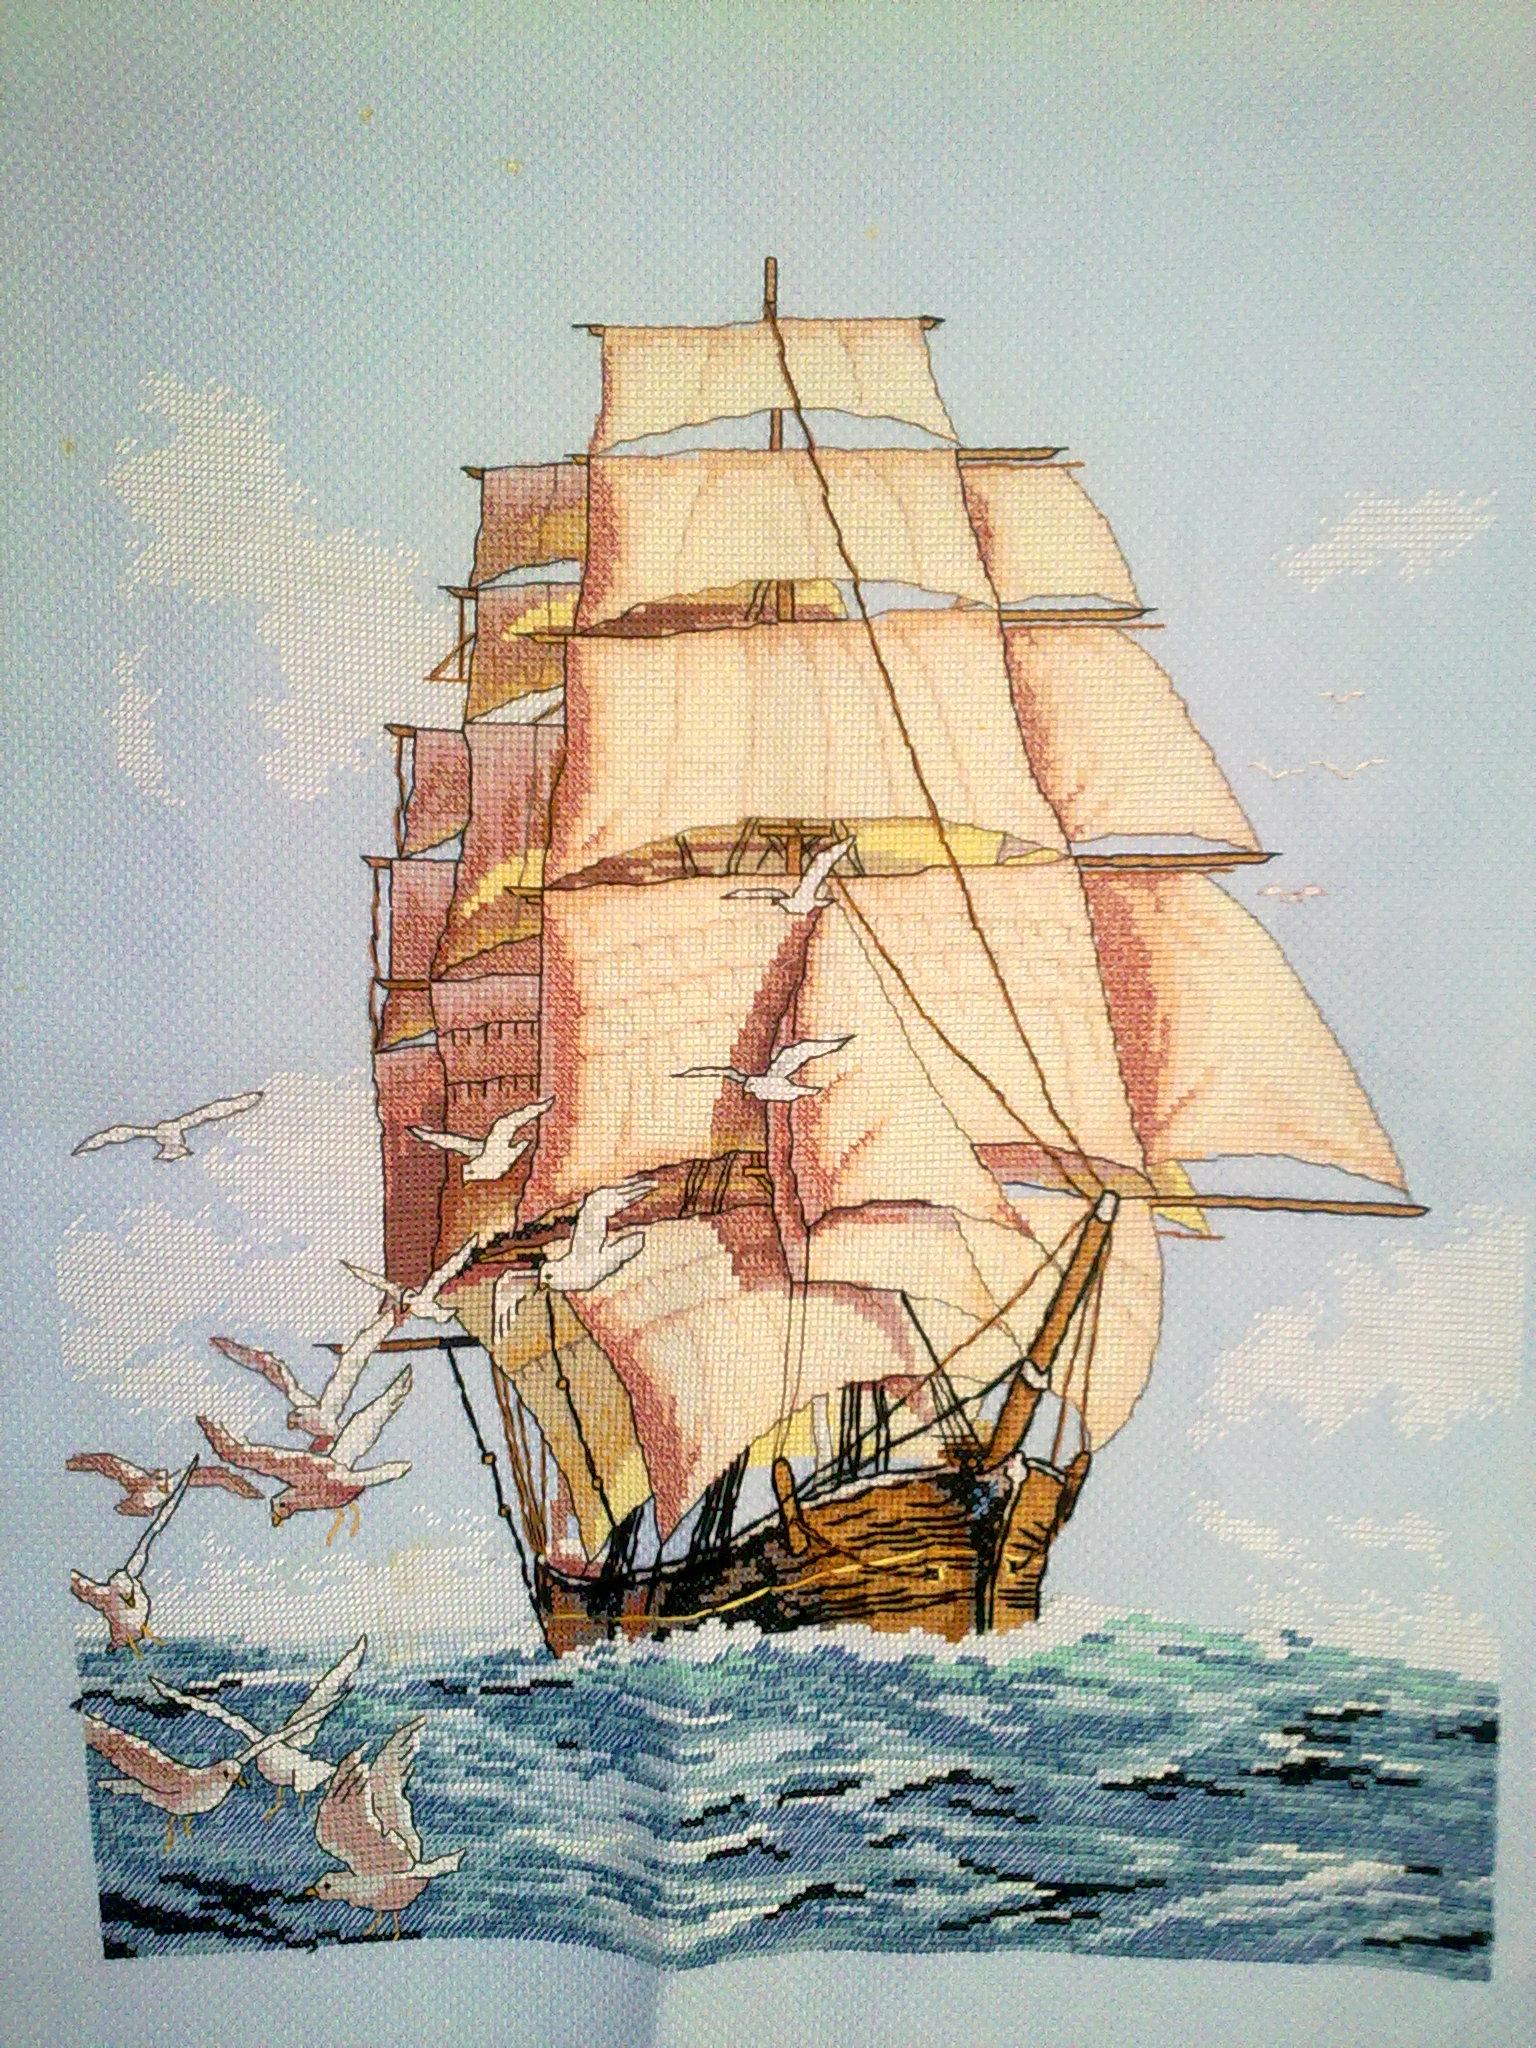 Вышивка крестом море и корабли